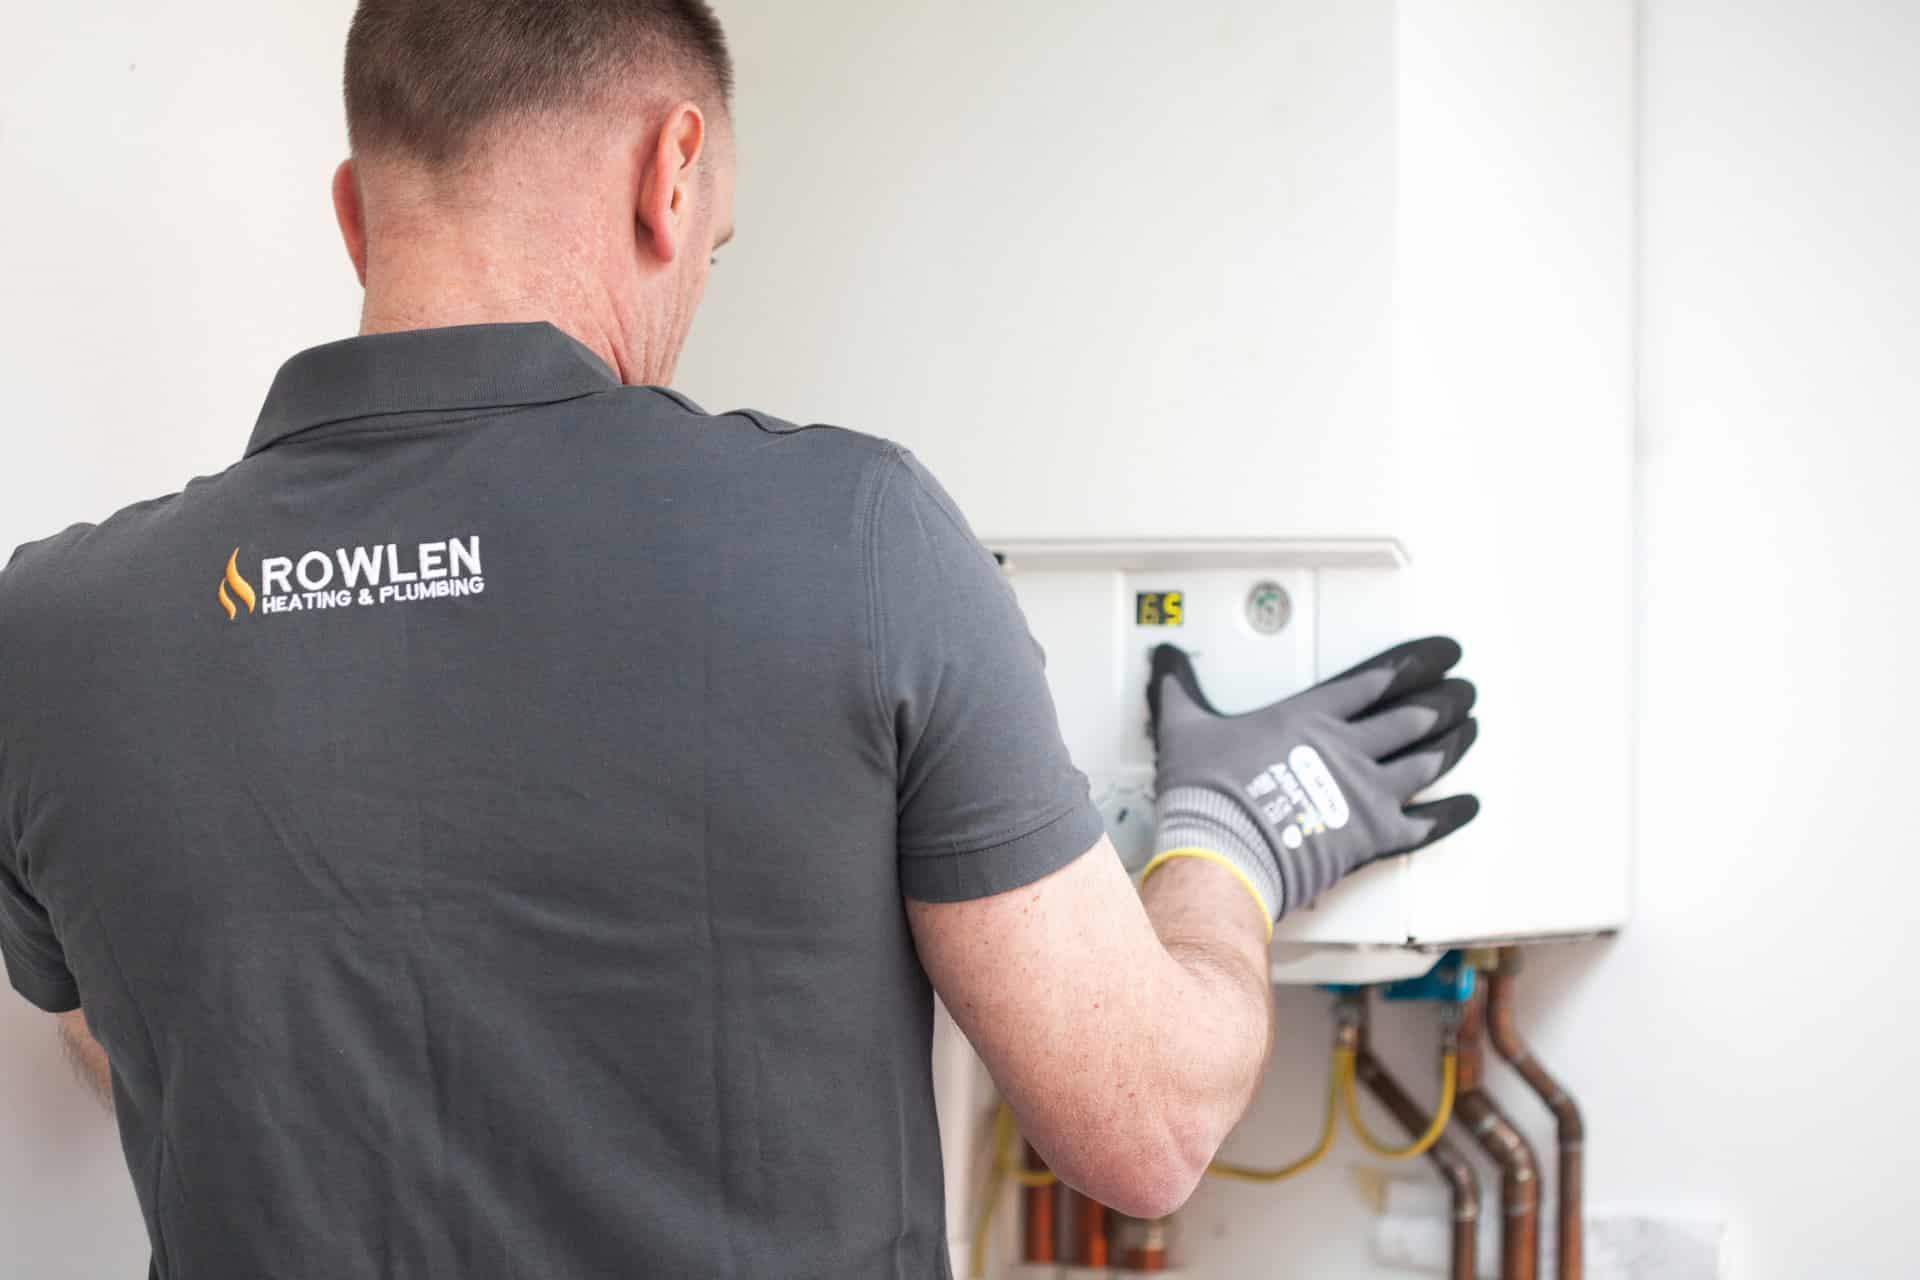 Commerical boiler service